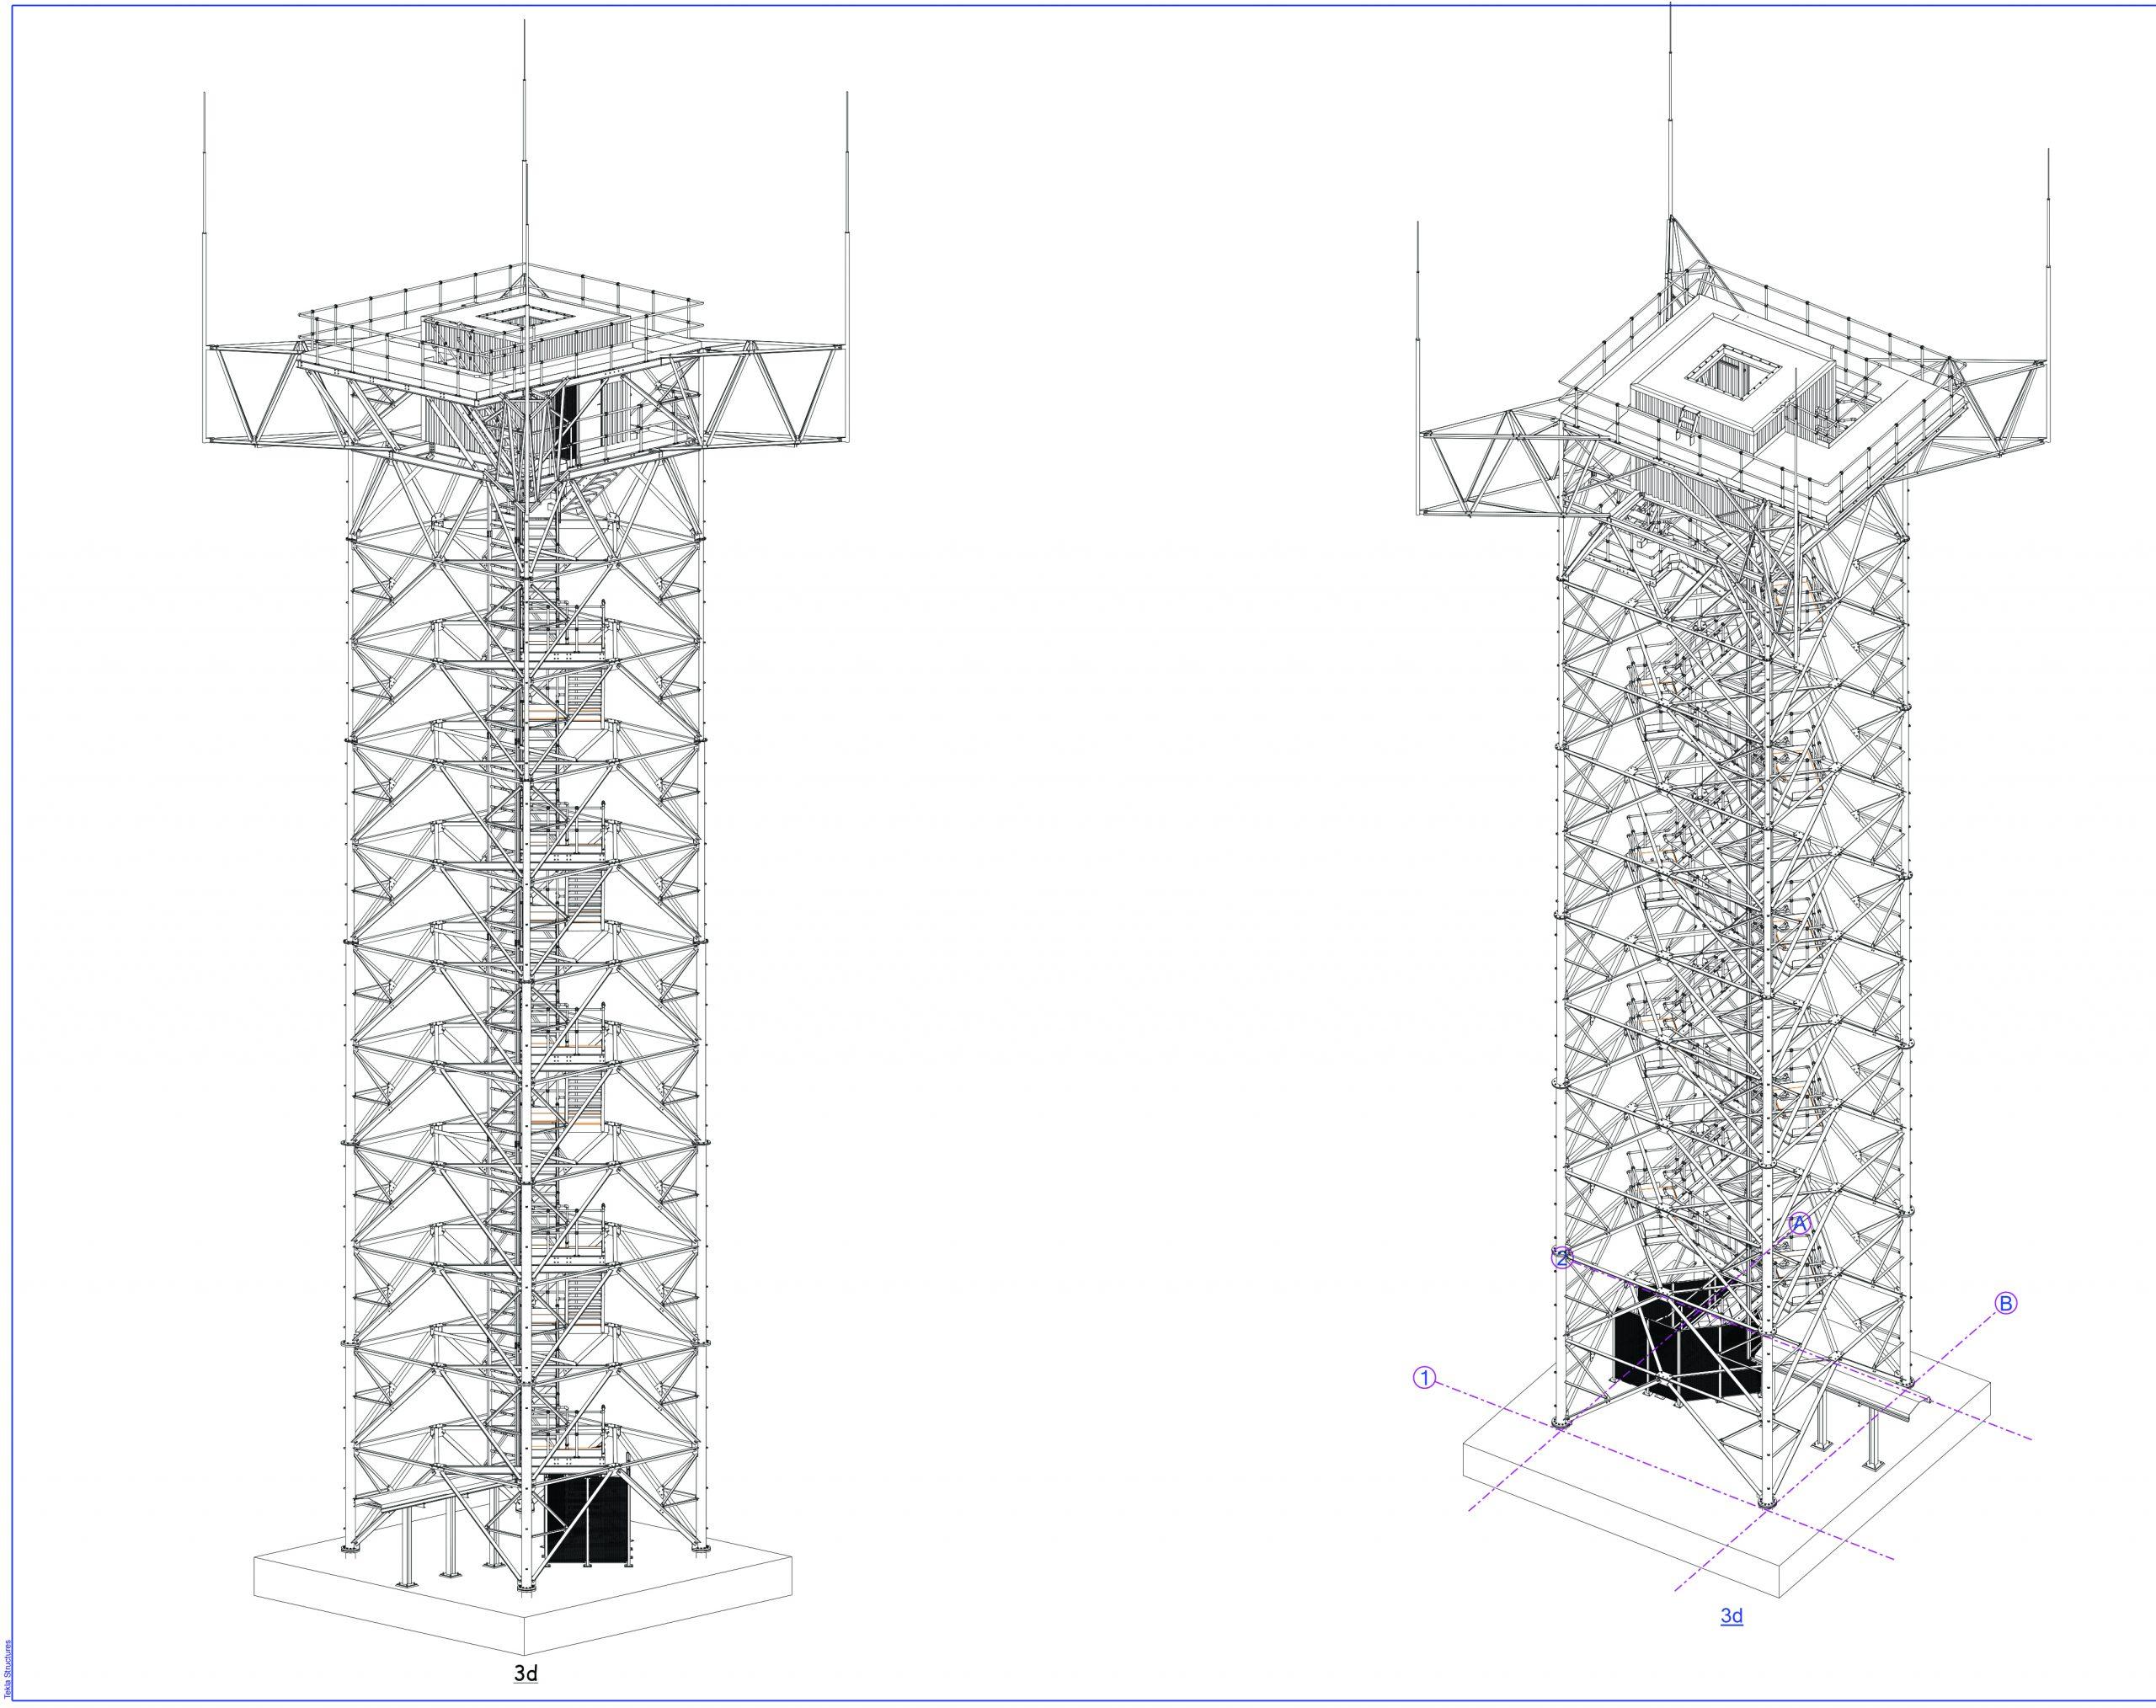 Tower installation at Cambridge International Airport